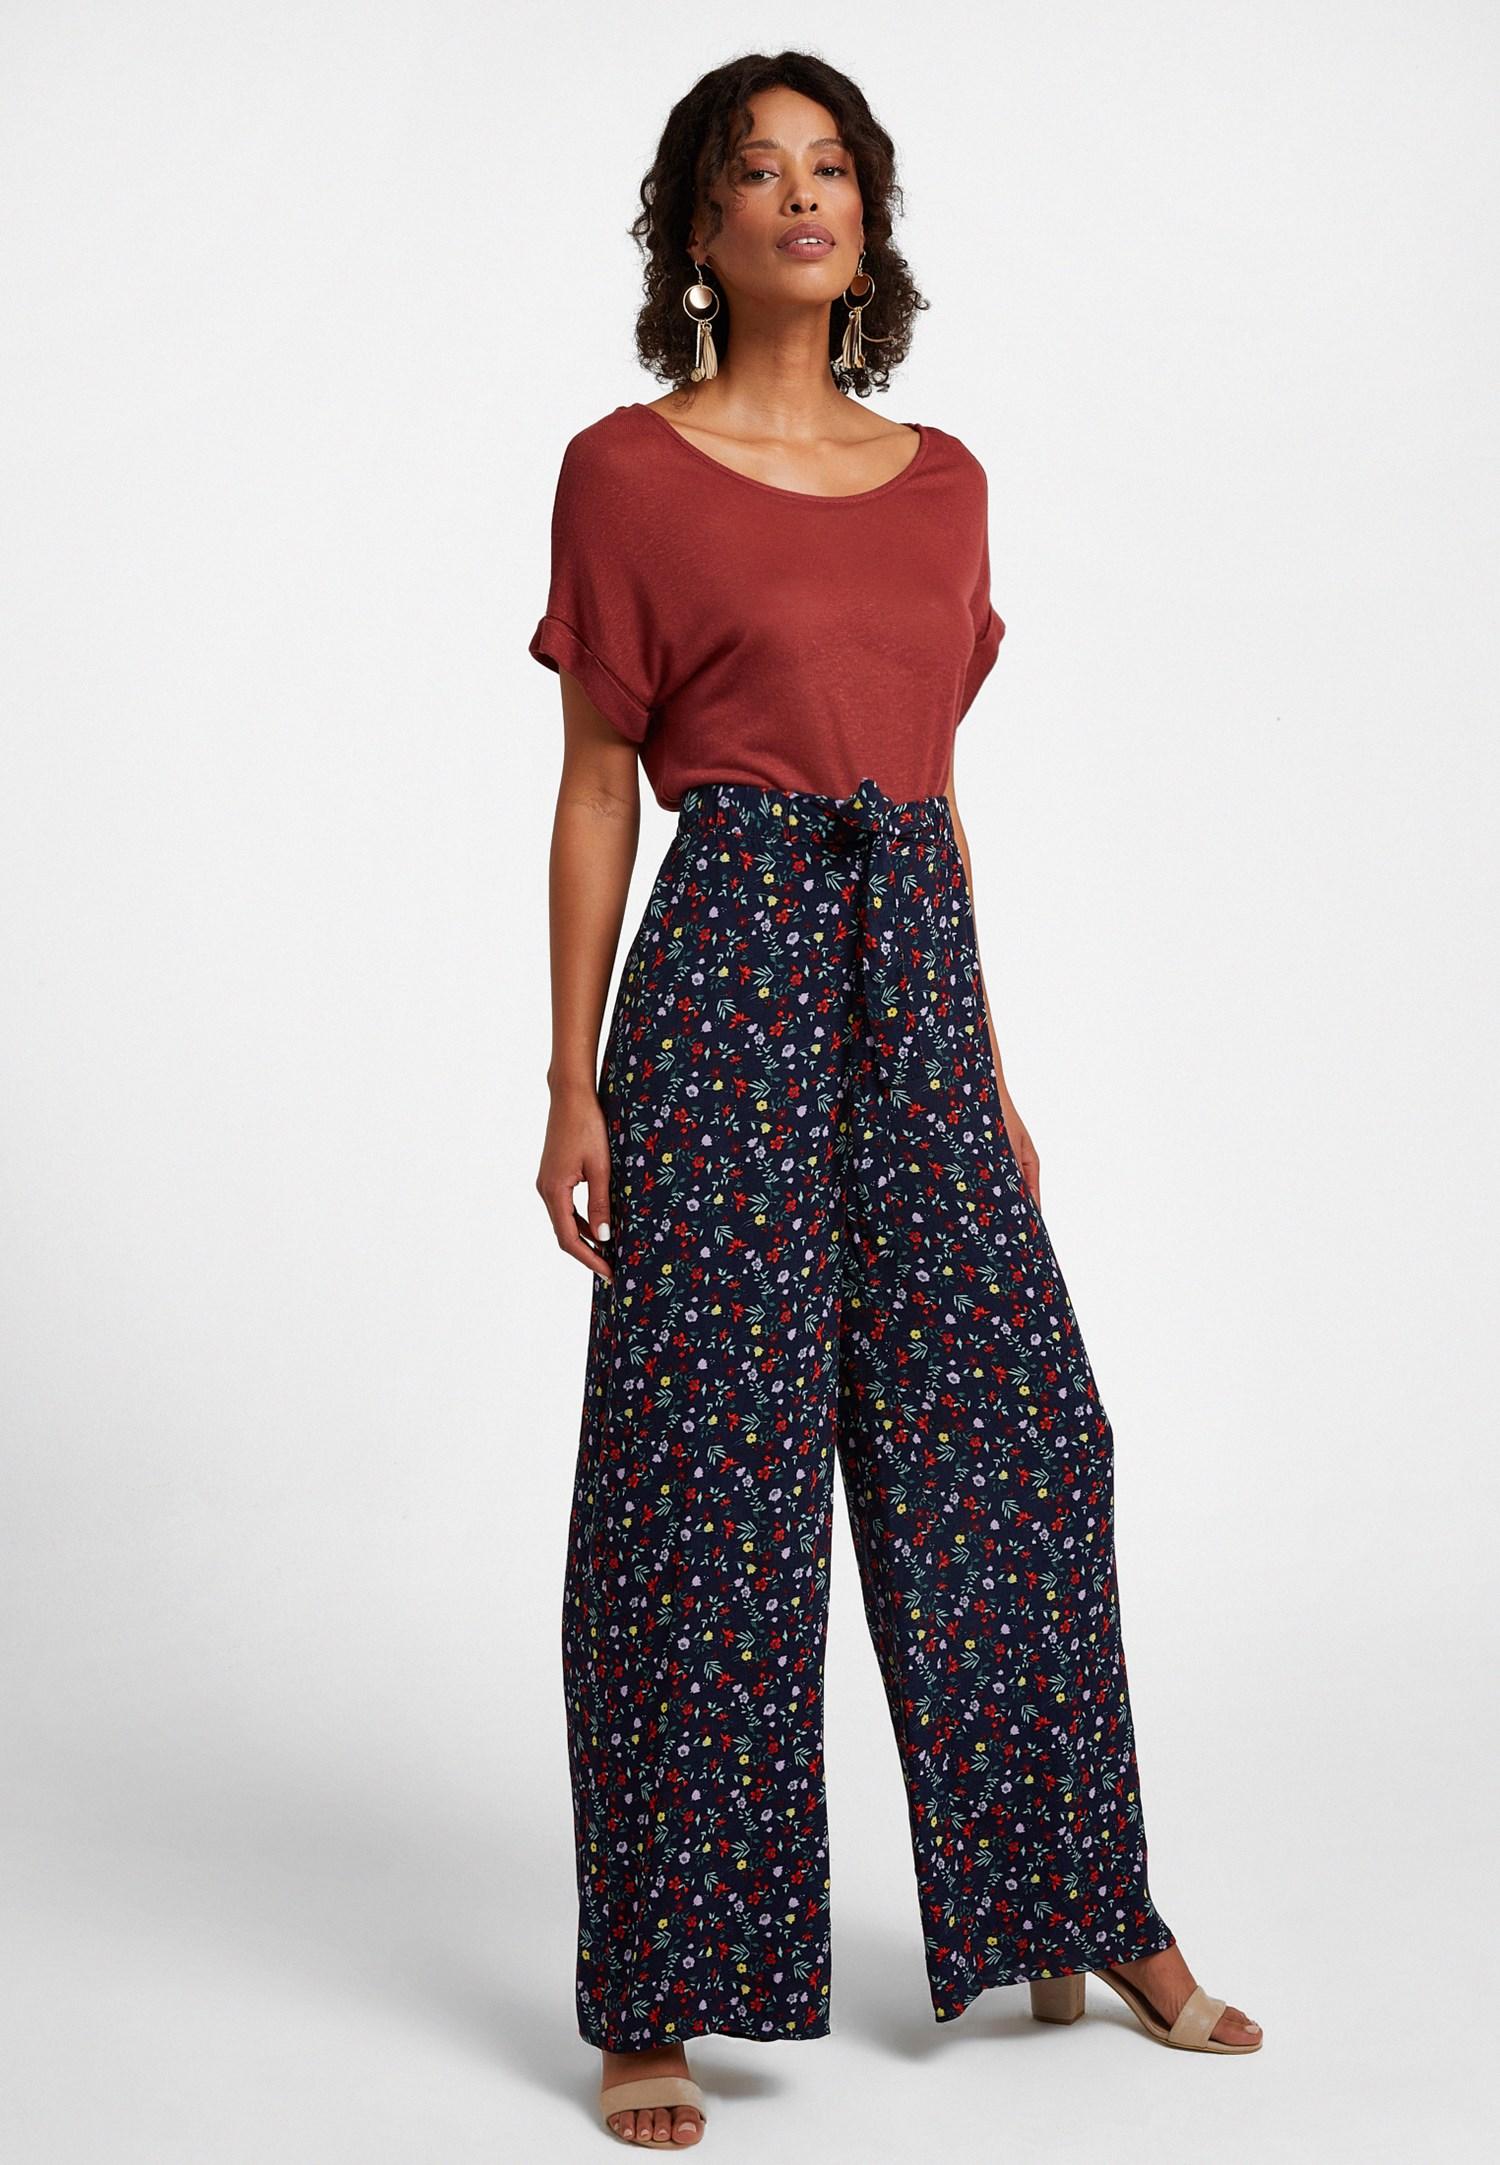 Bayan Çok Renkli Bol Paça Desenli Pantolon